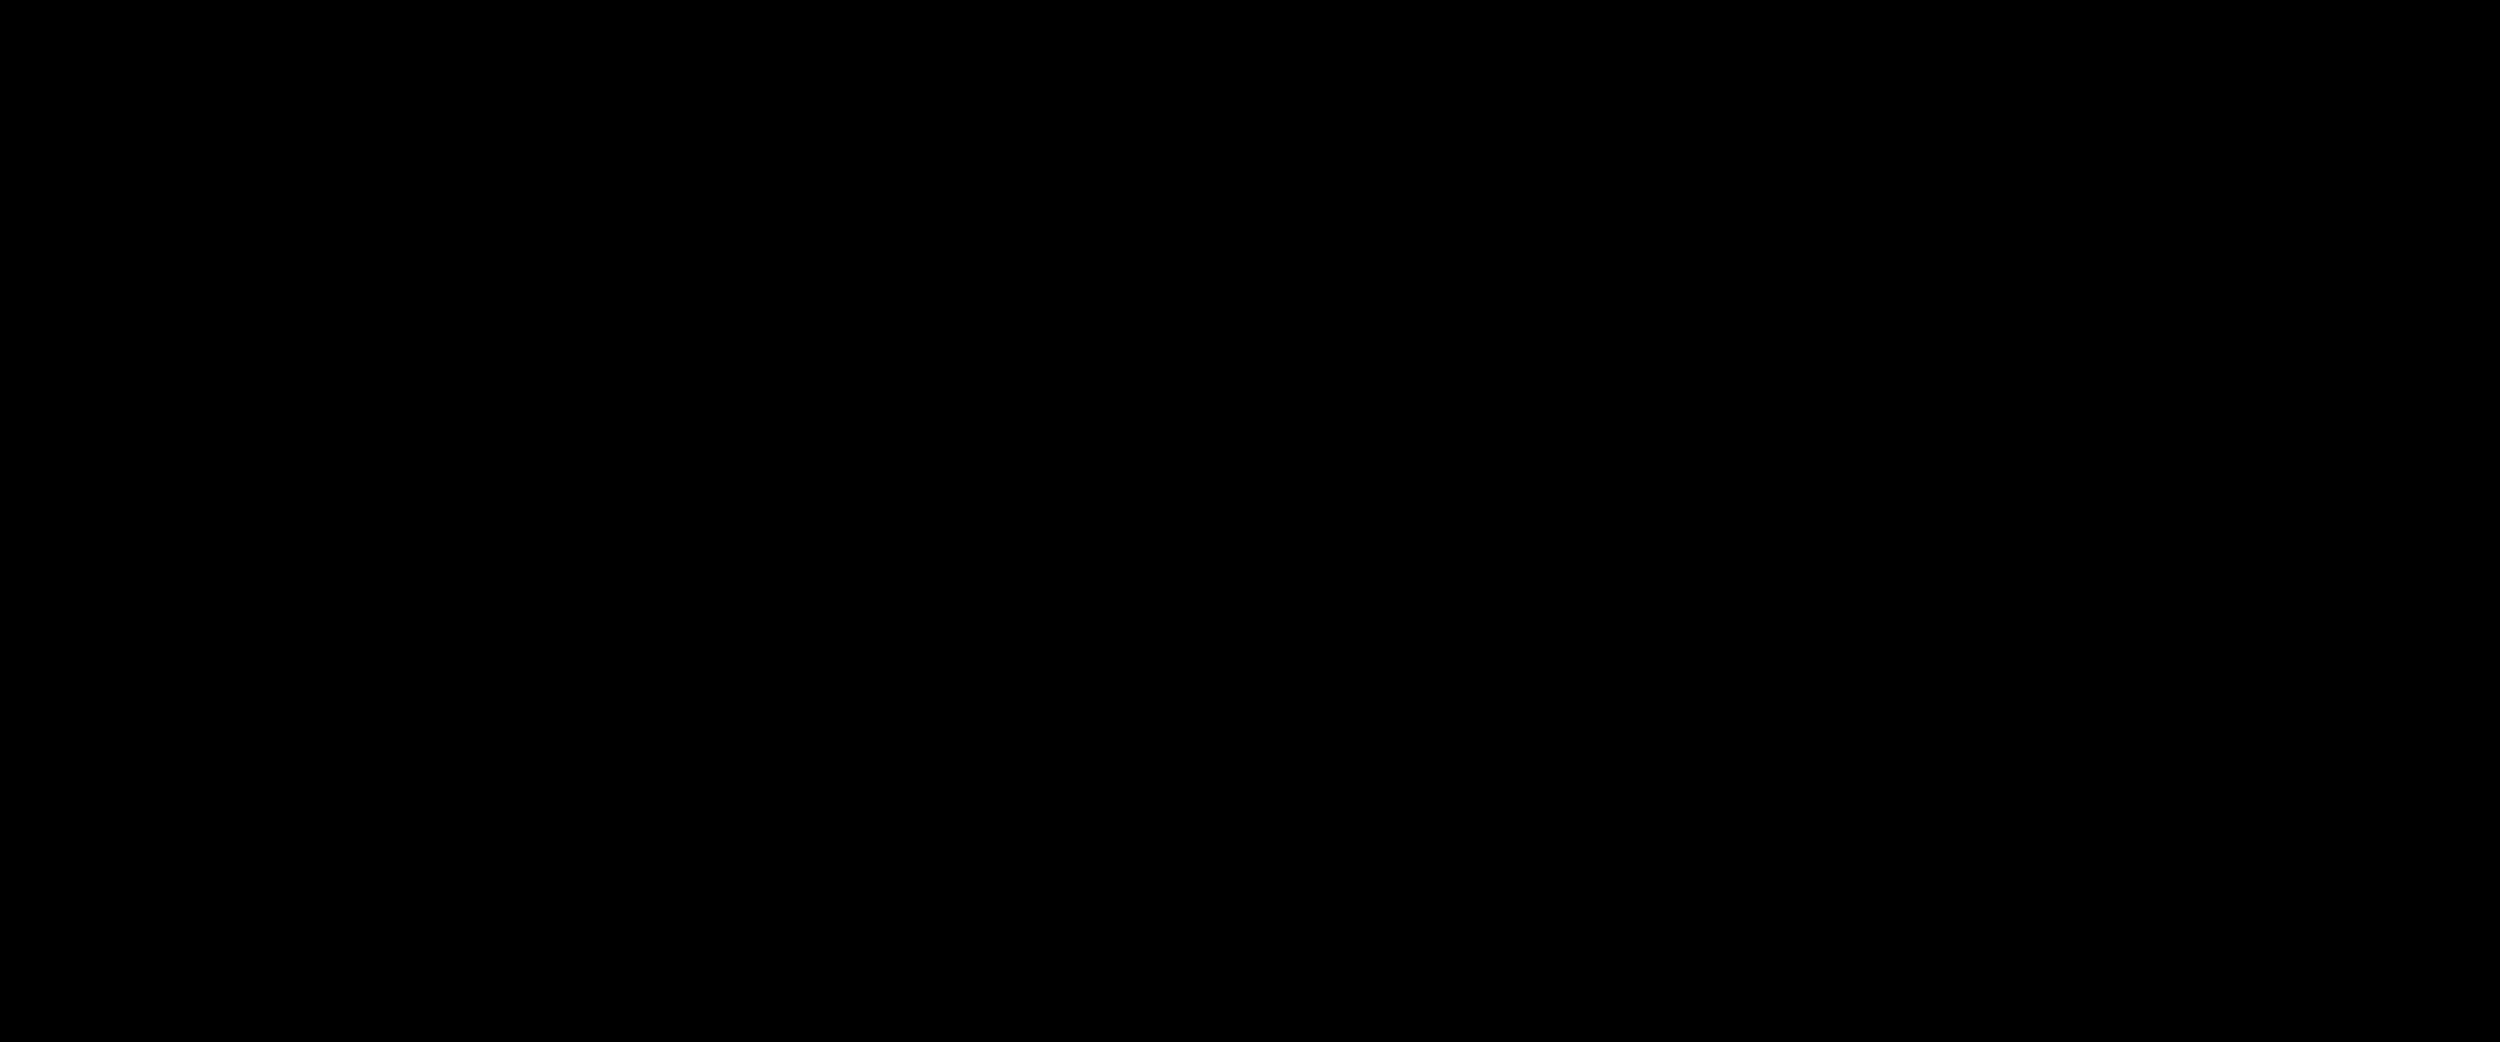 standard-01.png